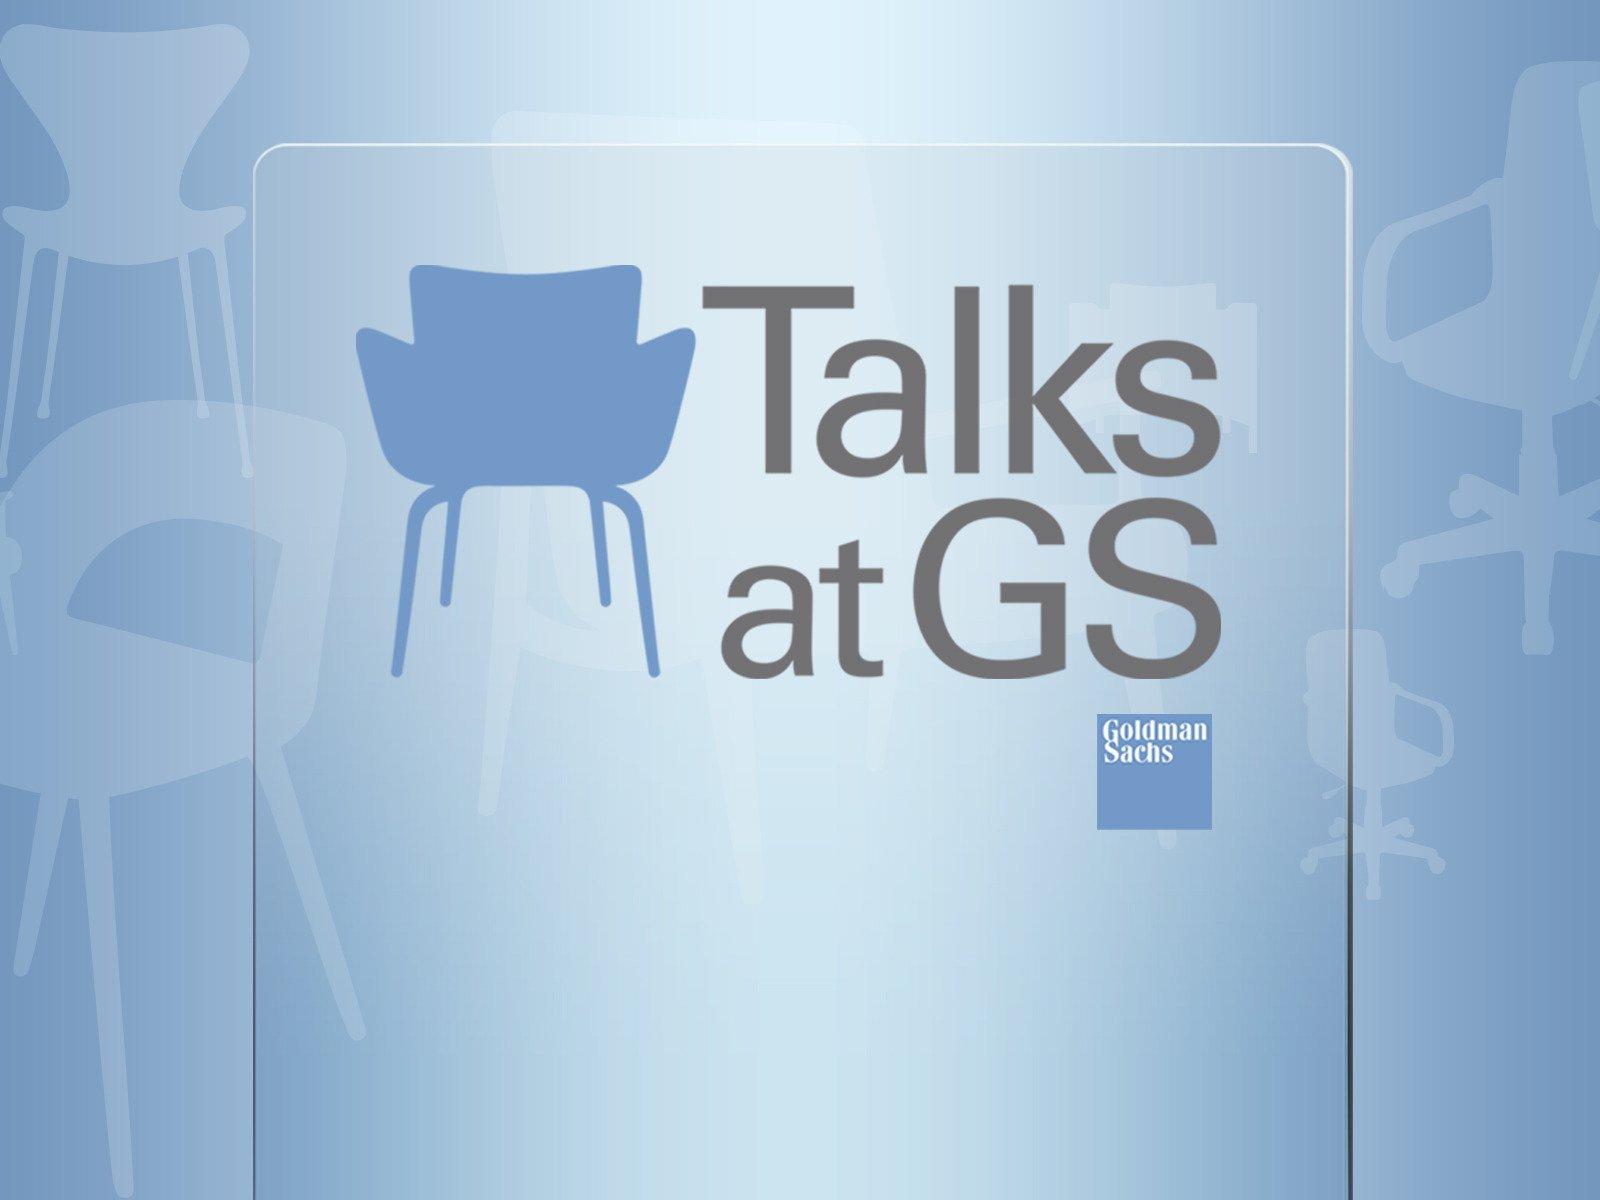 Talks at GS - Season 4